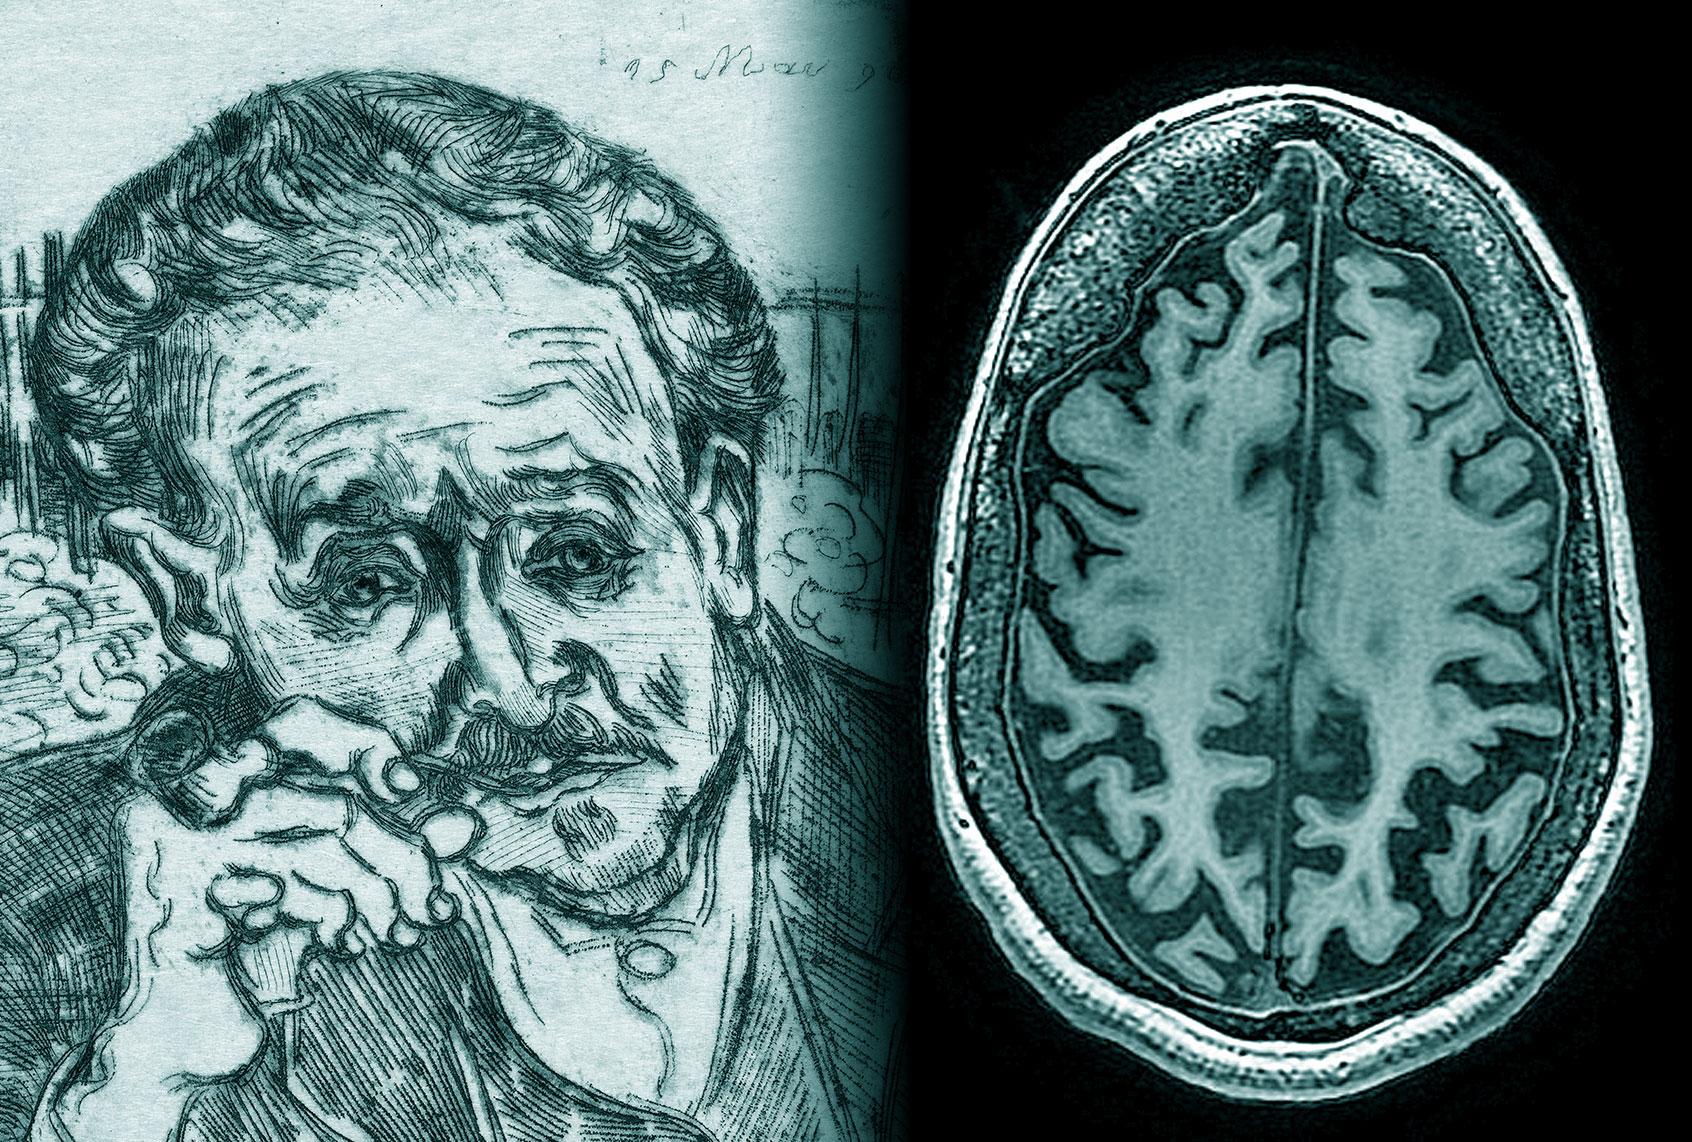 brain-scan-dr-gachet-van-gogh-etching-11